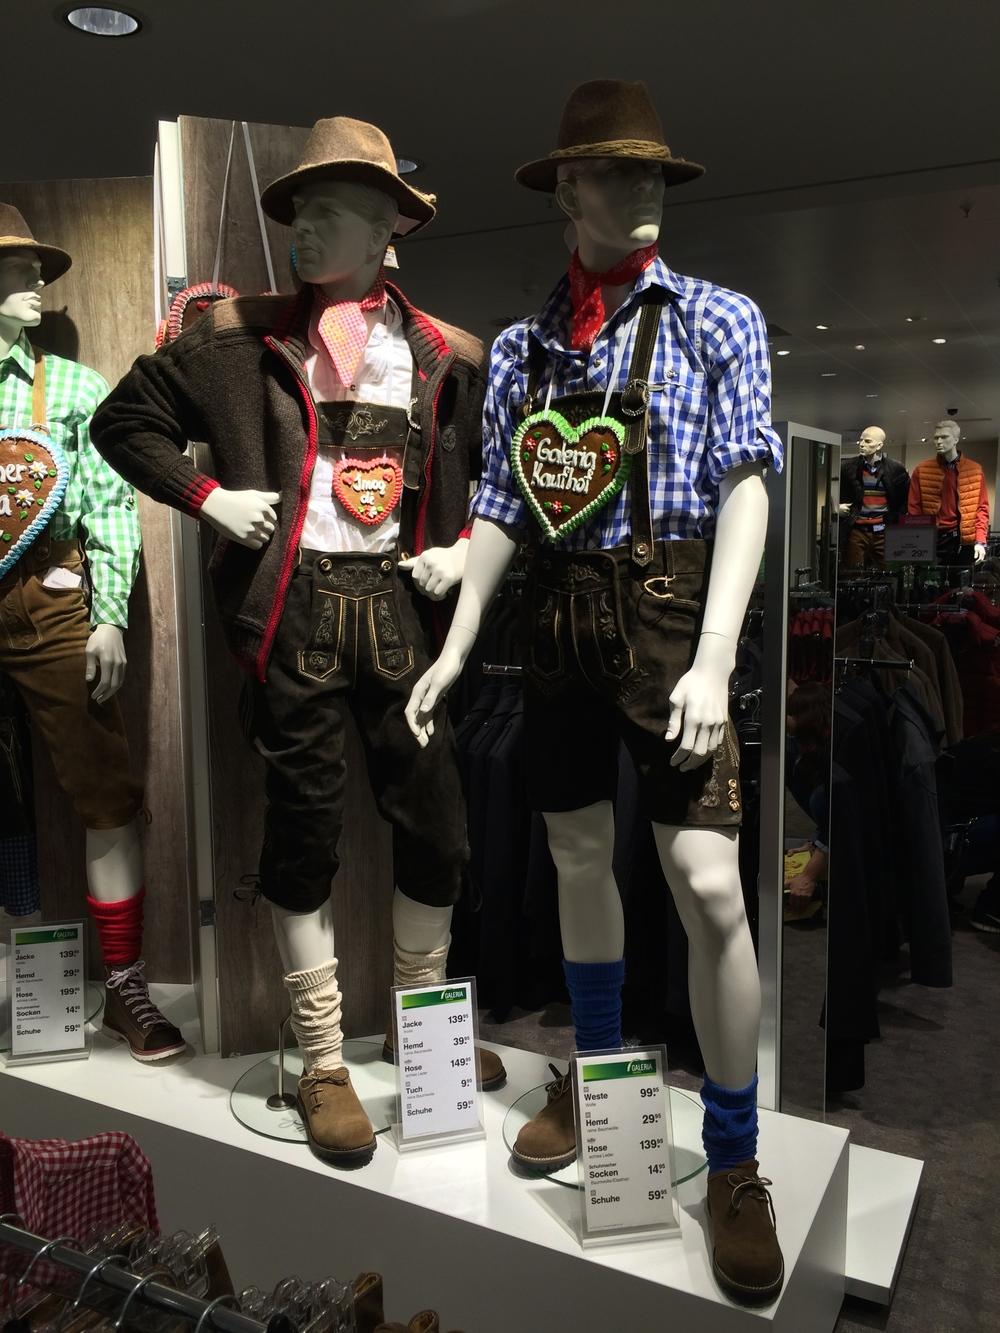 Oktoberfest fashion